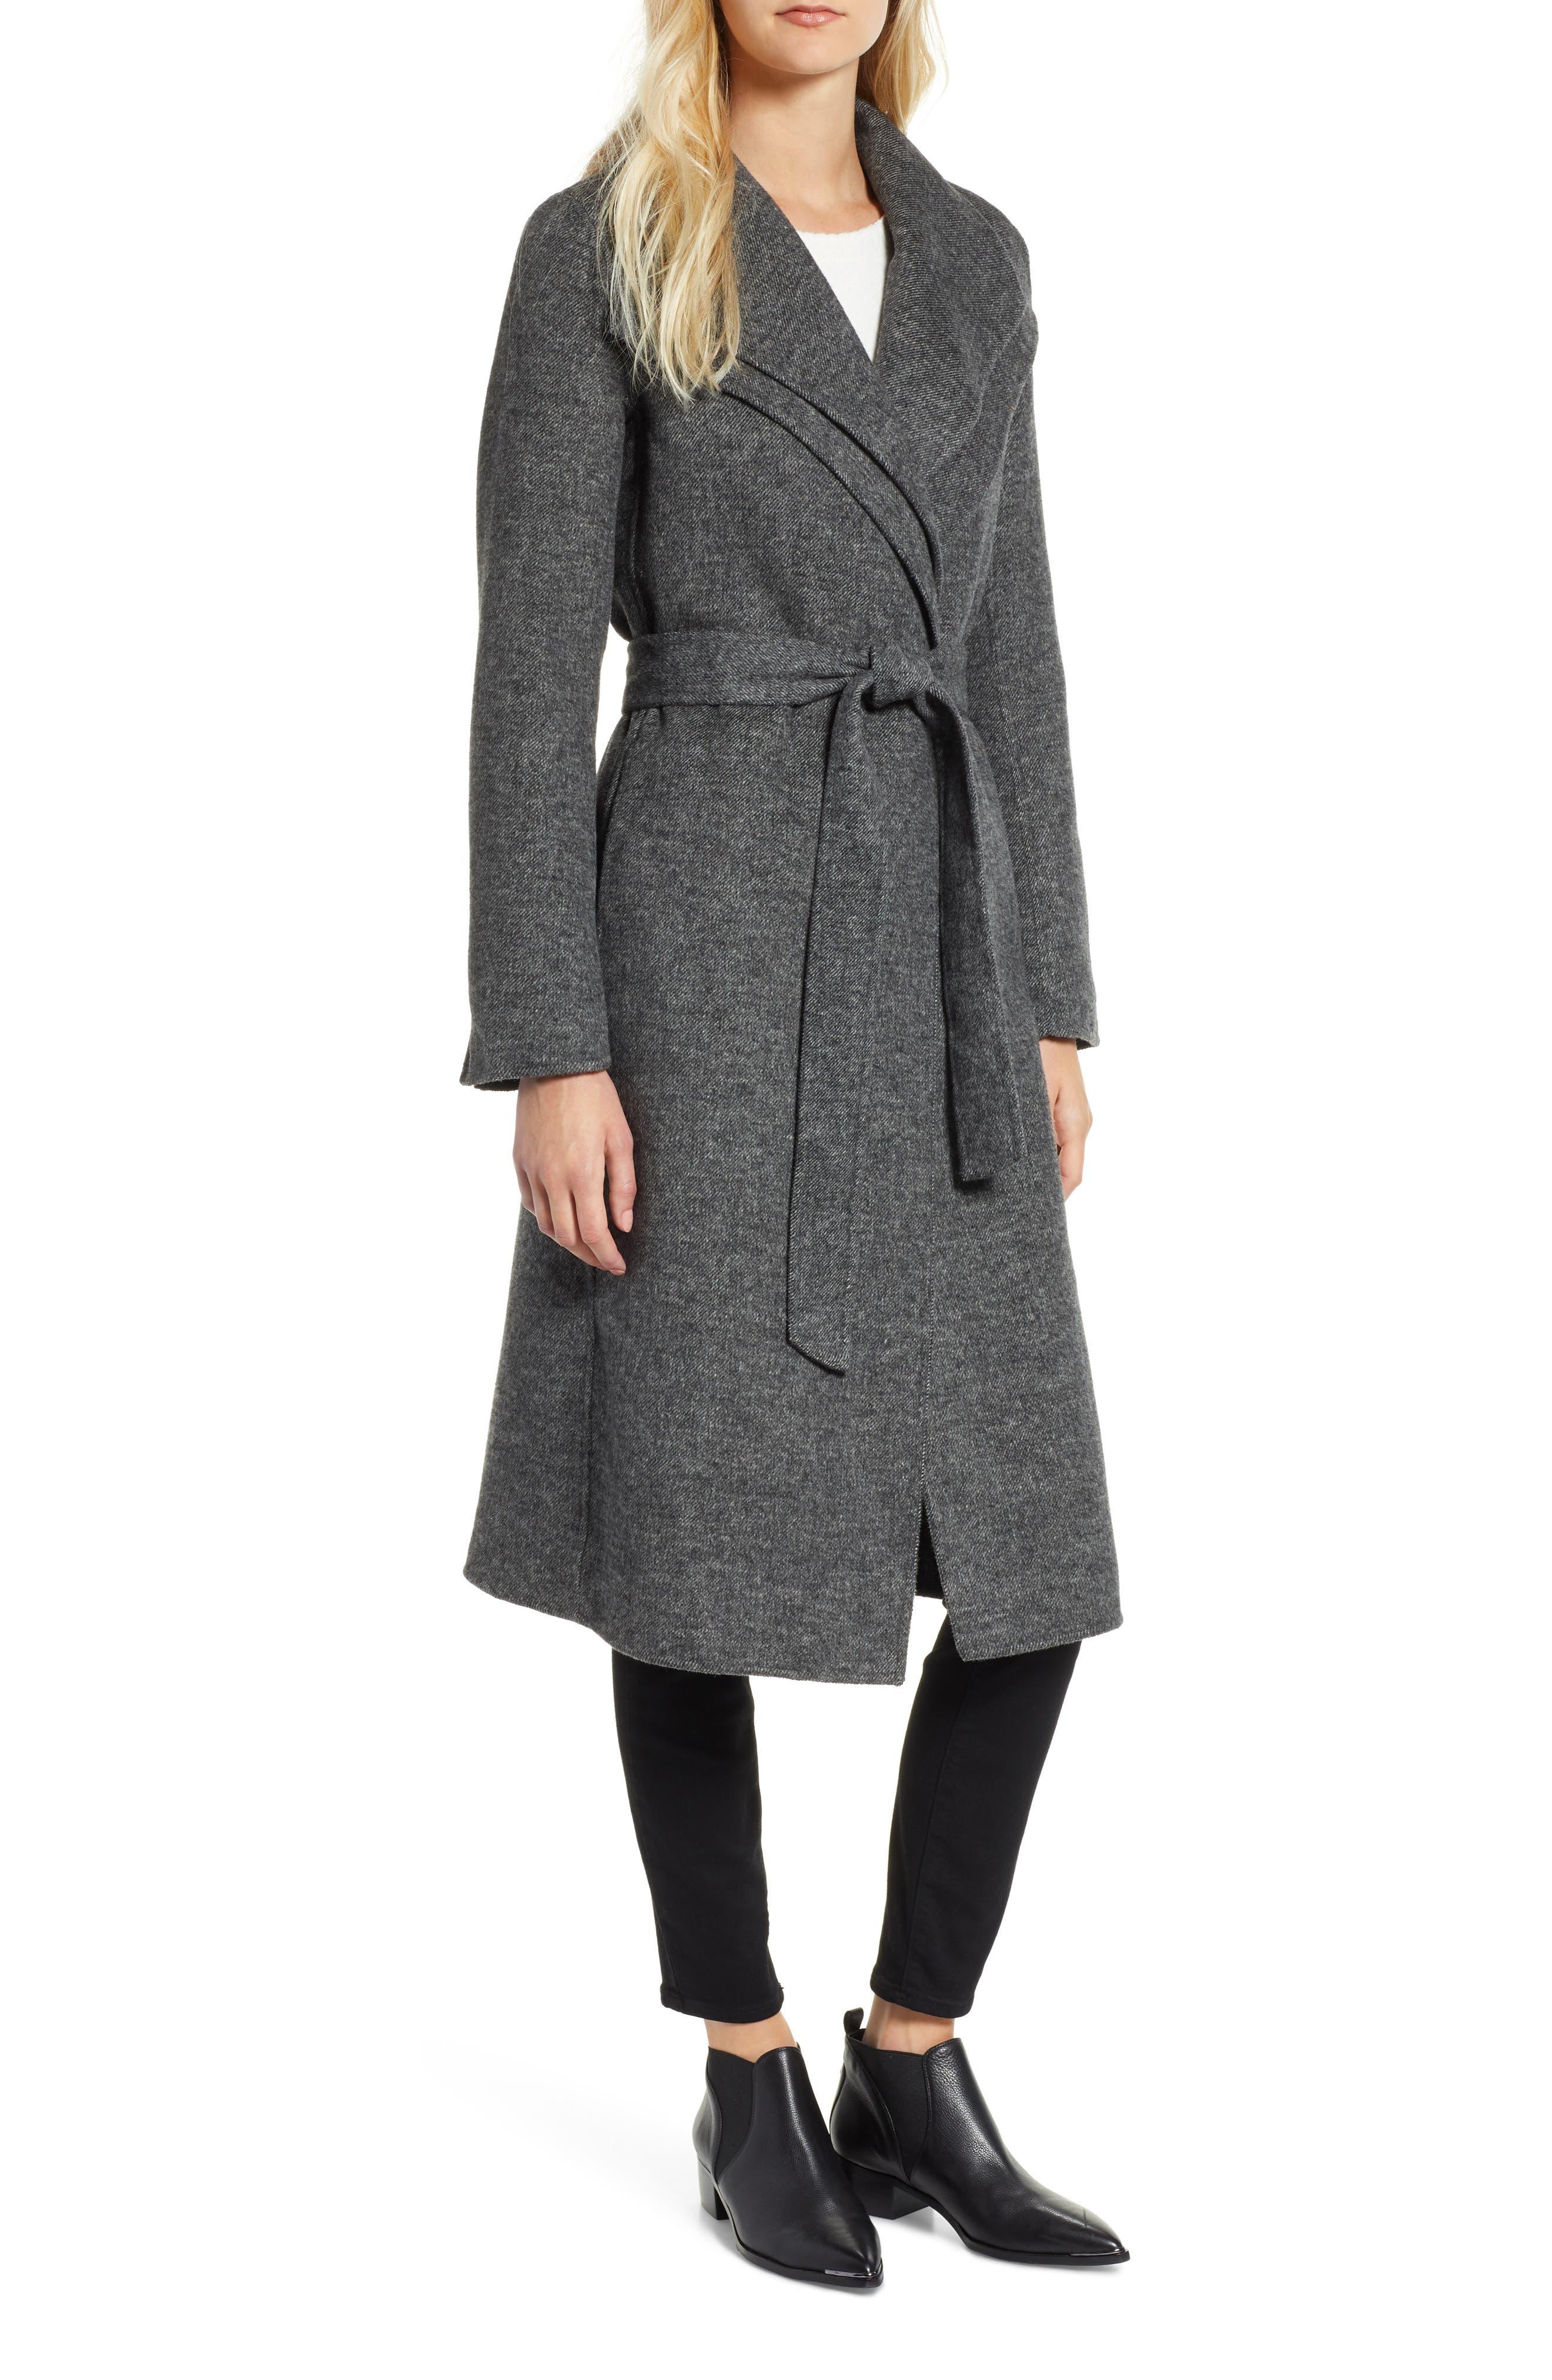 Elliot Wool Blend Wrap Coat,                         Main,                         color, 022